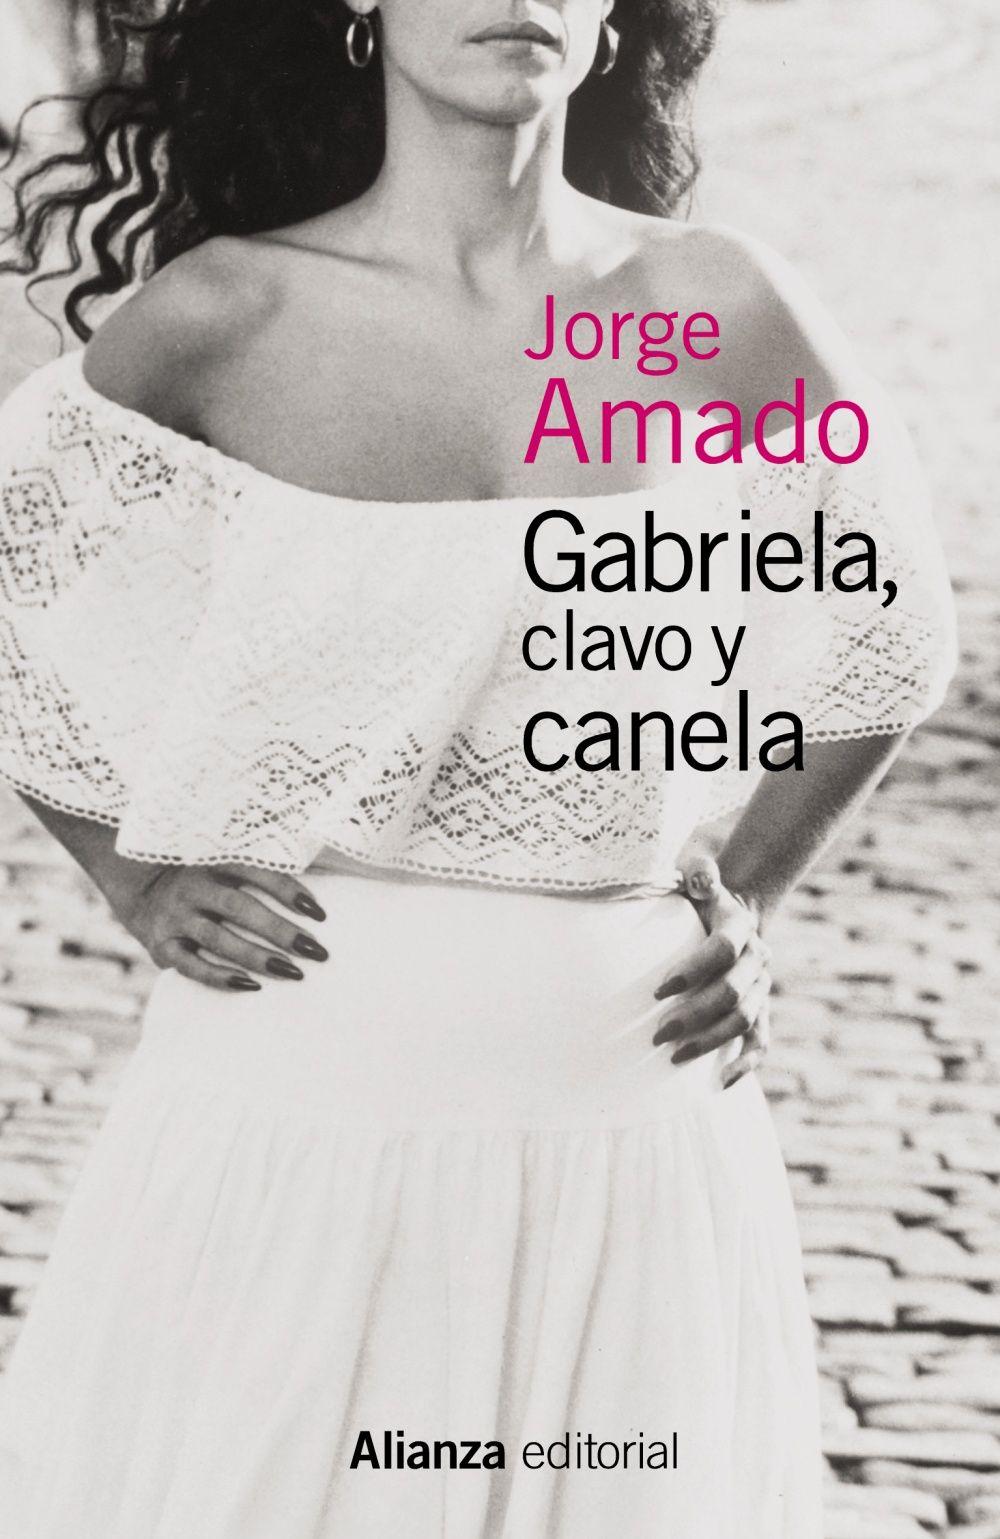 GABRIELA CLAVO Y CANELA